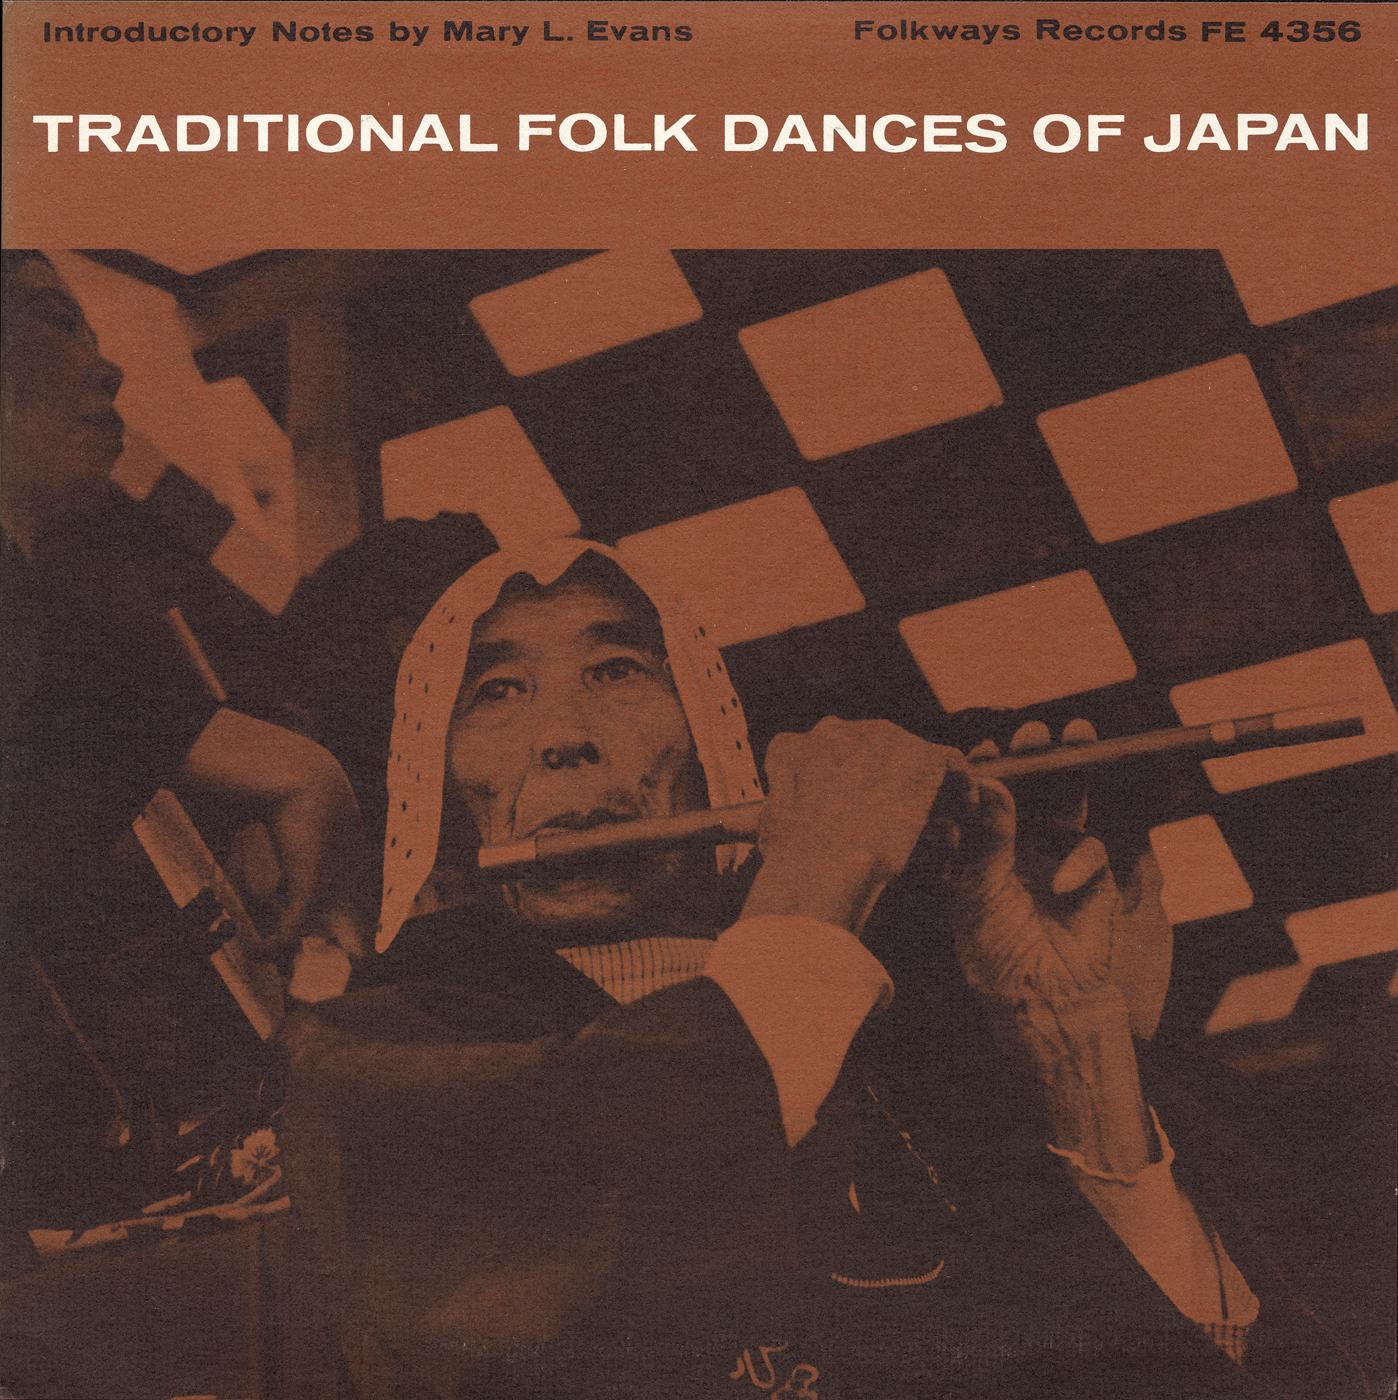 51e. Japanese-American Internment